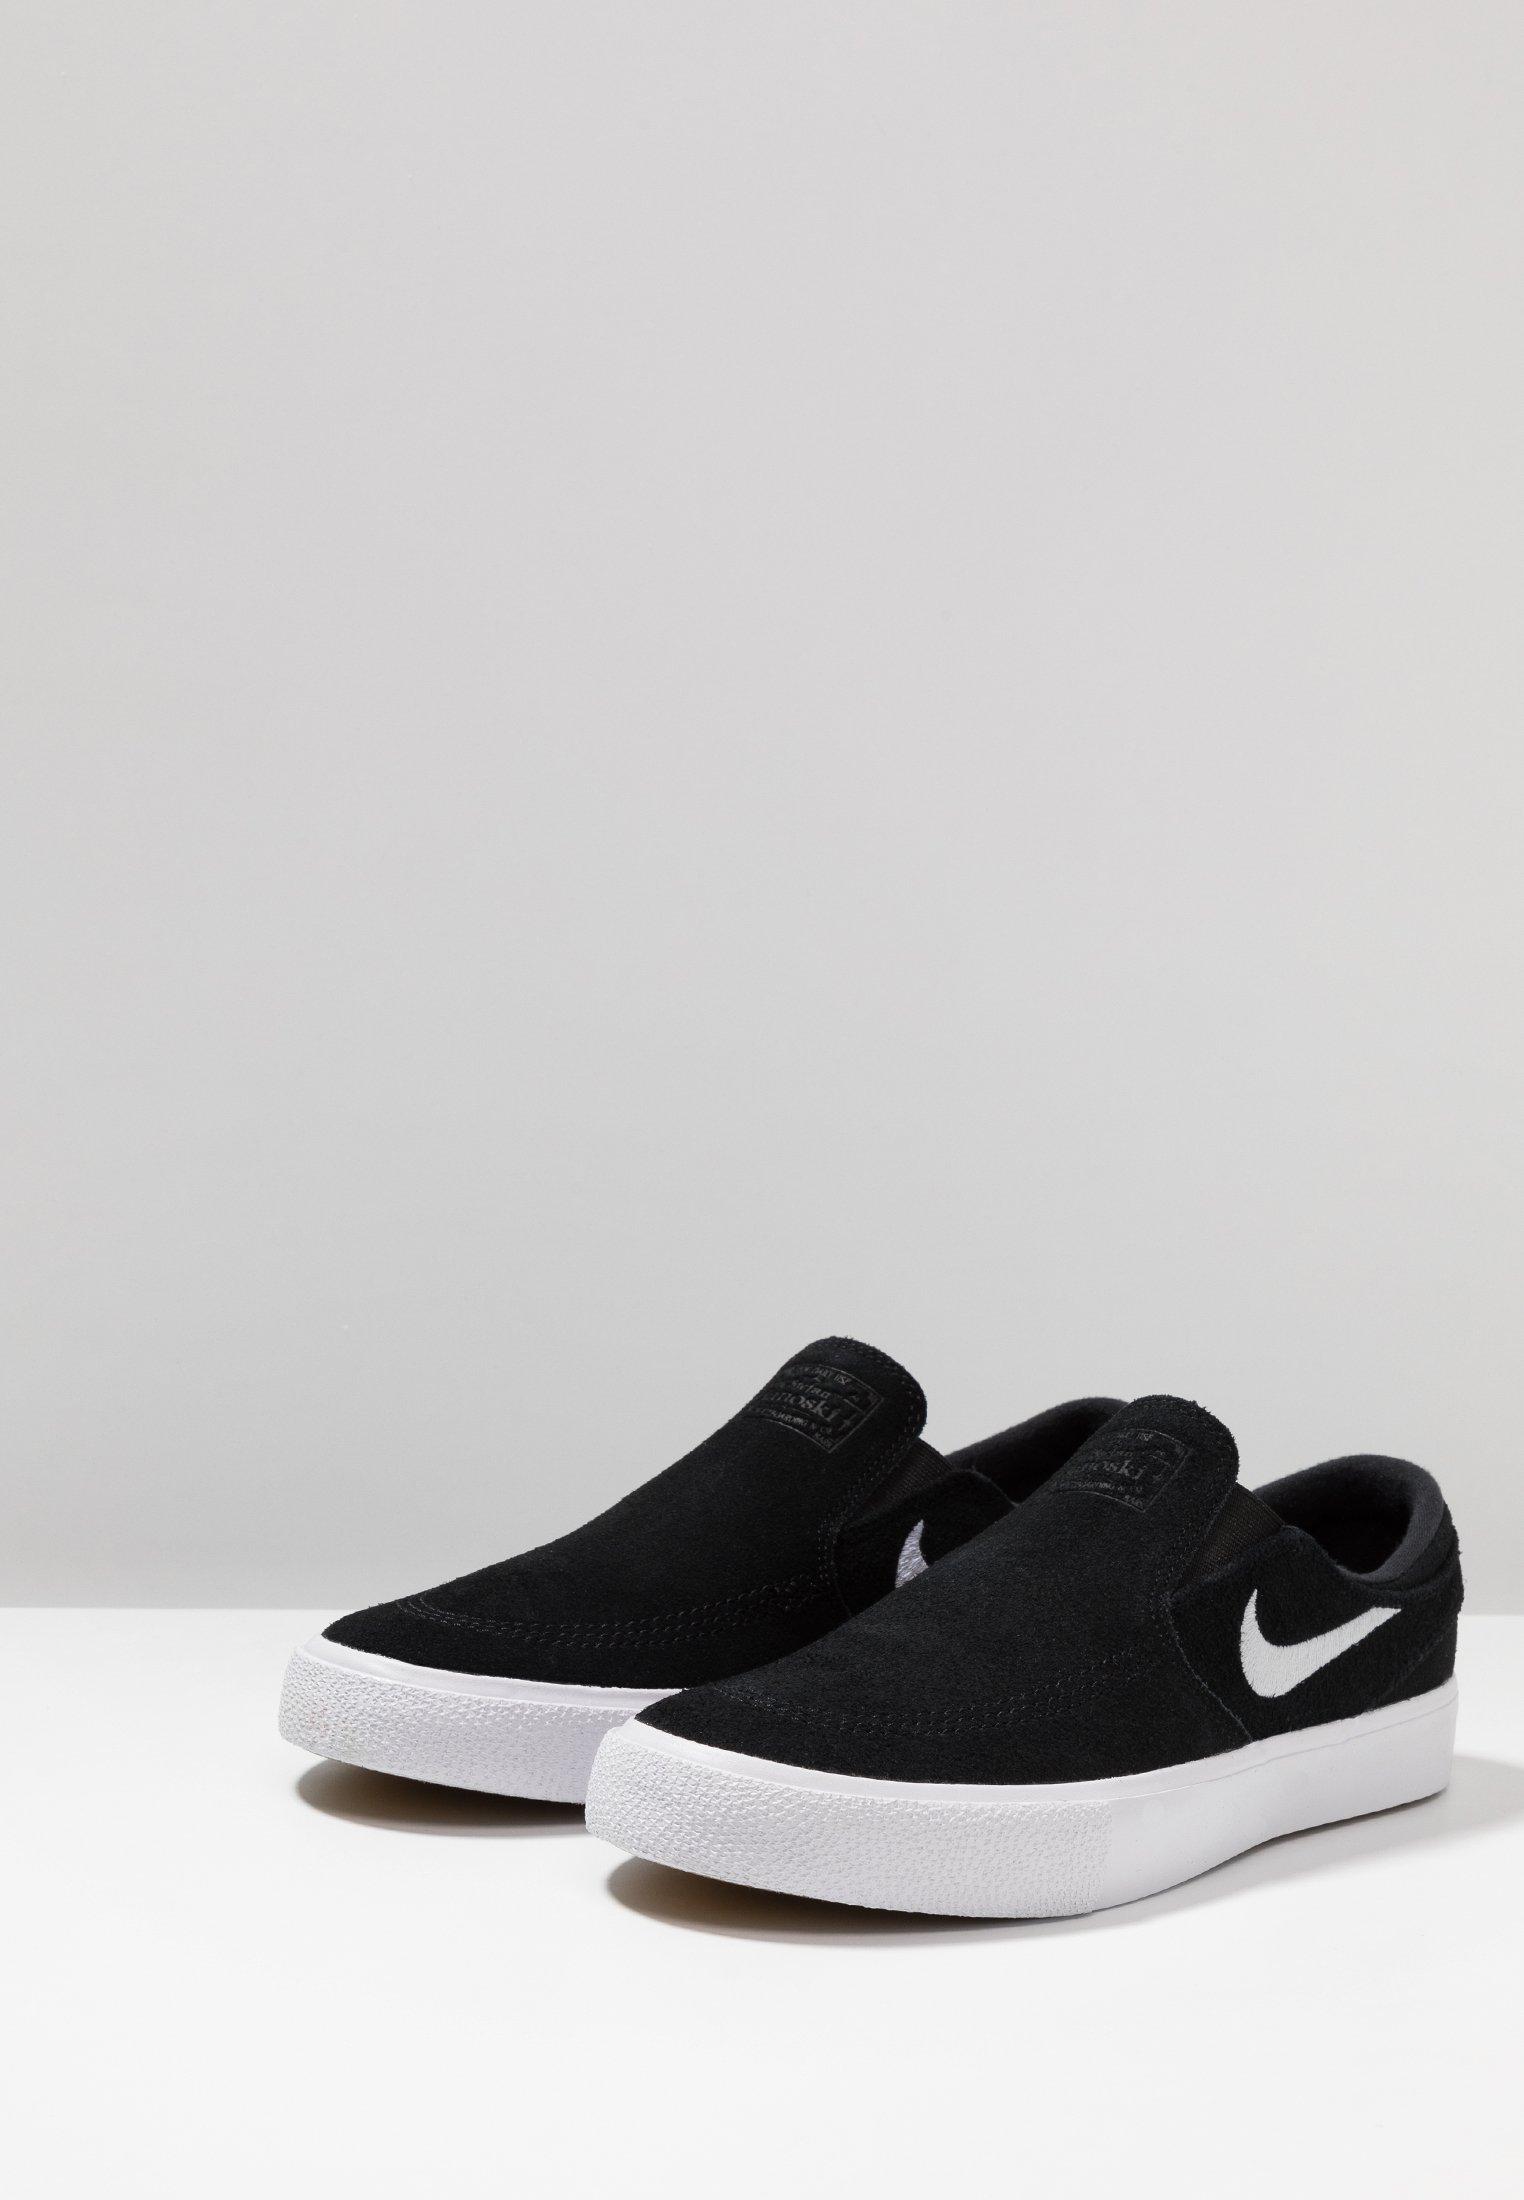 Scarpe da donna Nike SB ZOOM JANOSKI Scarpe senza lacci black/white